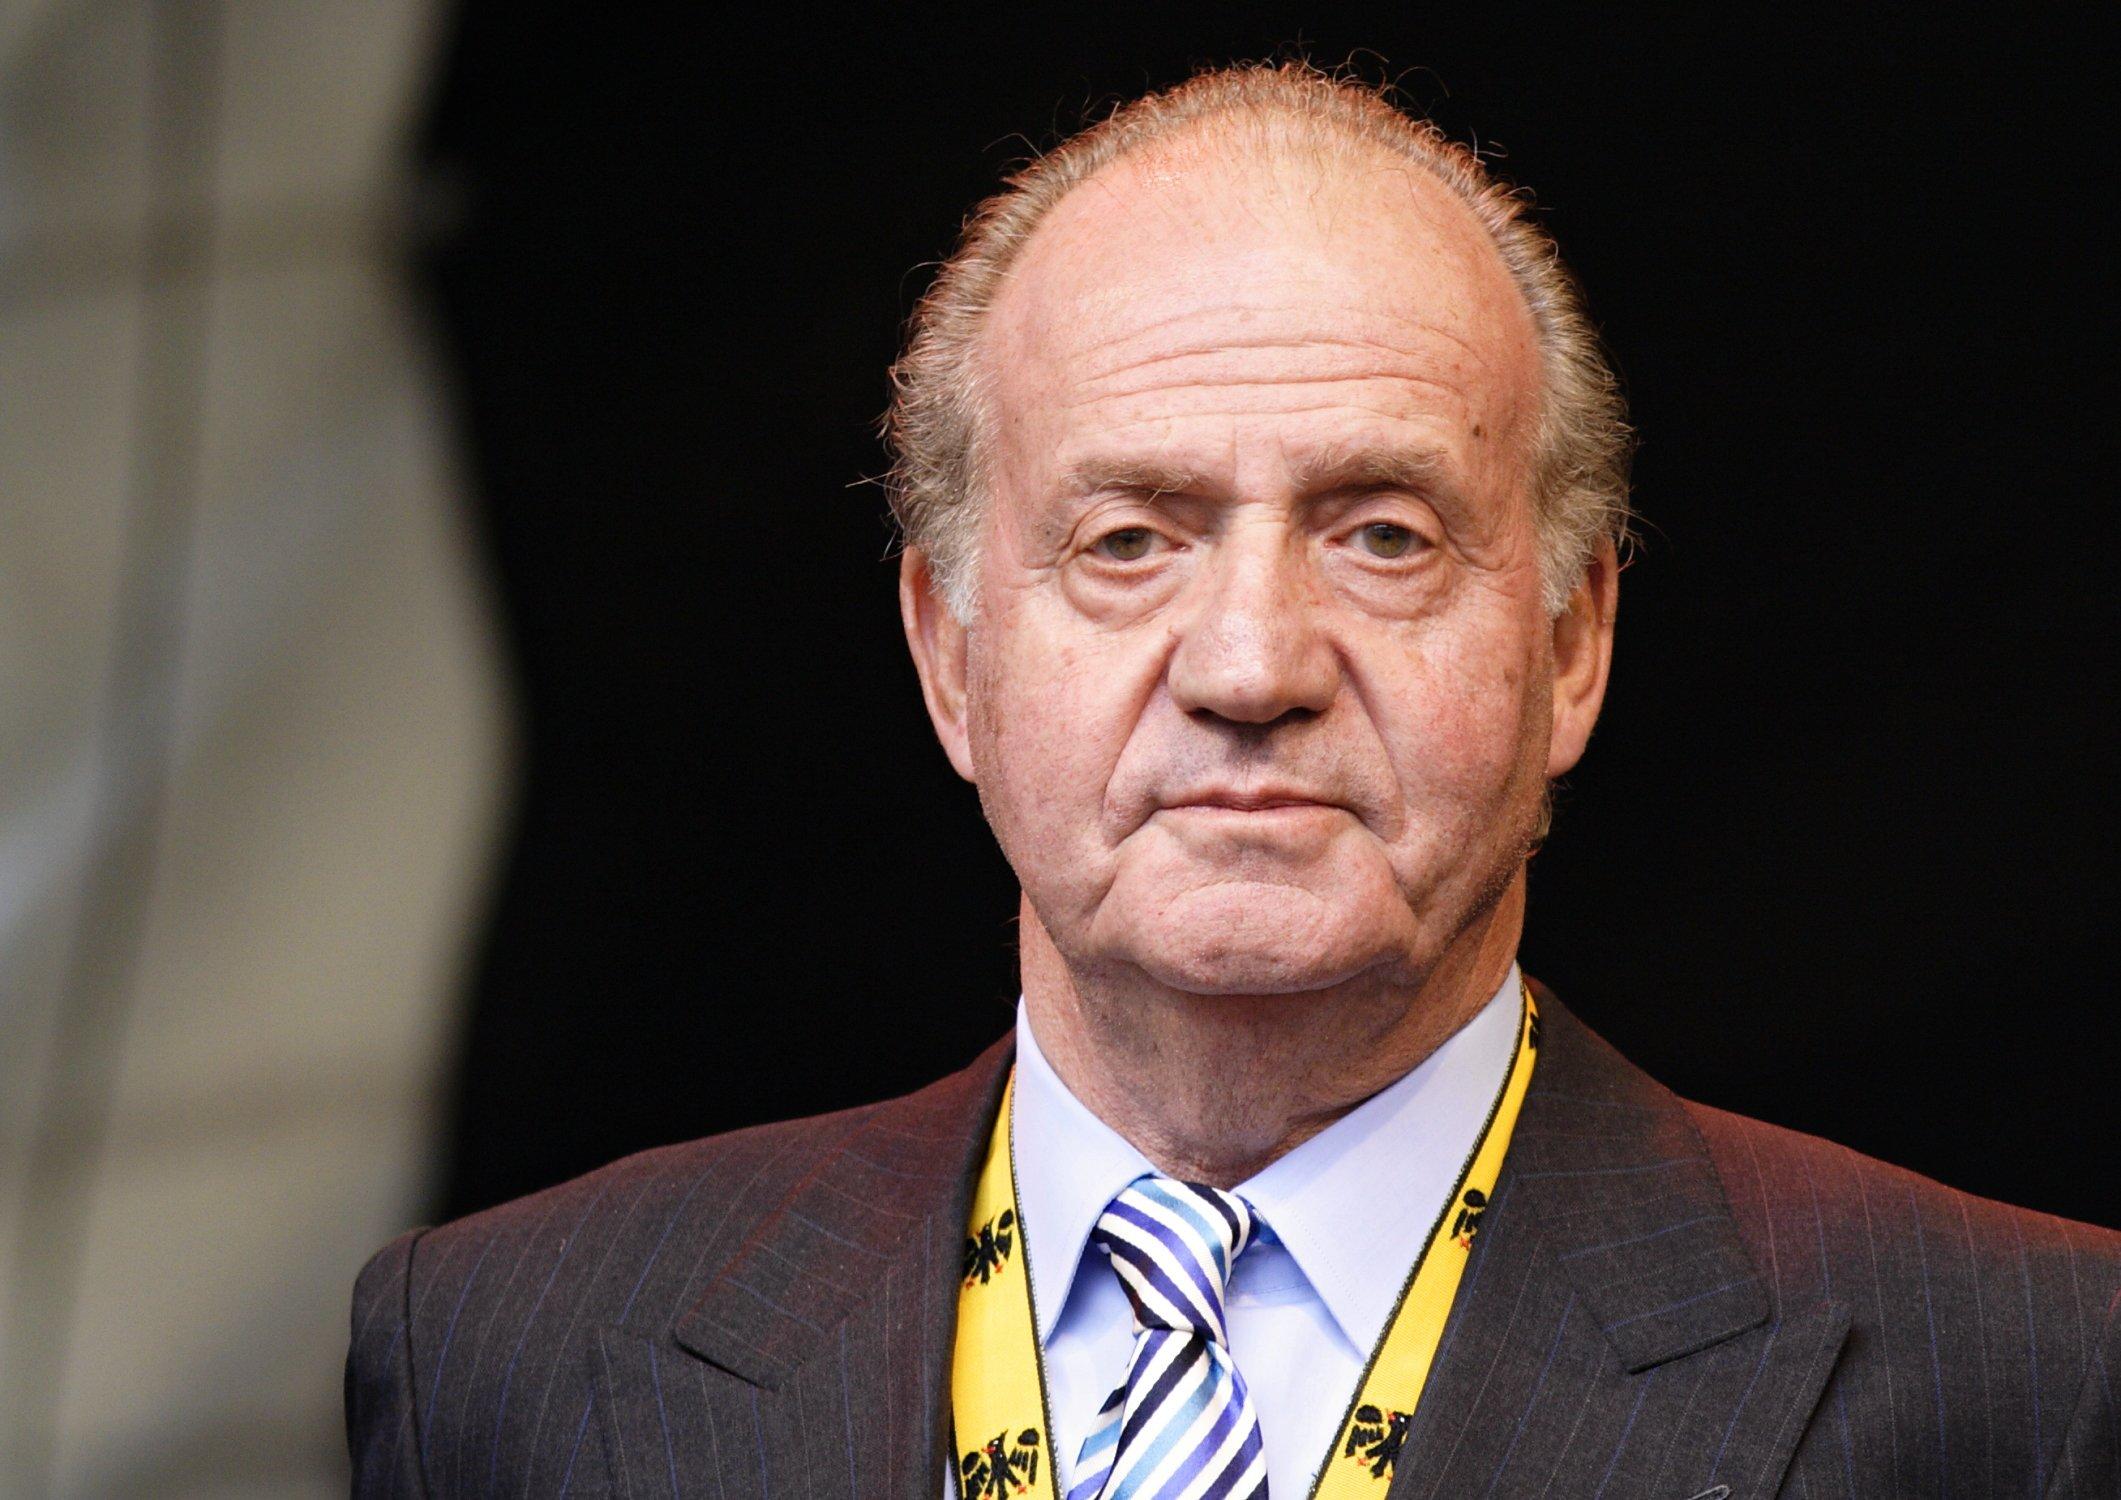 El Rey Juan Carlos. | Imagen: Wikimedia Commons